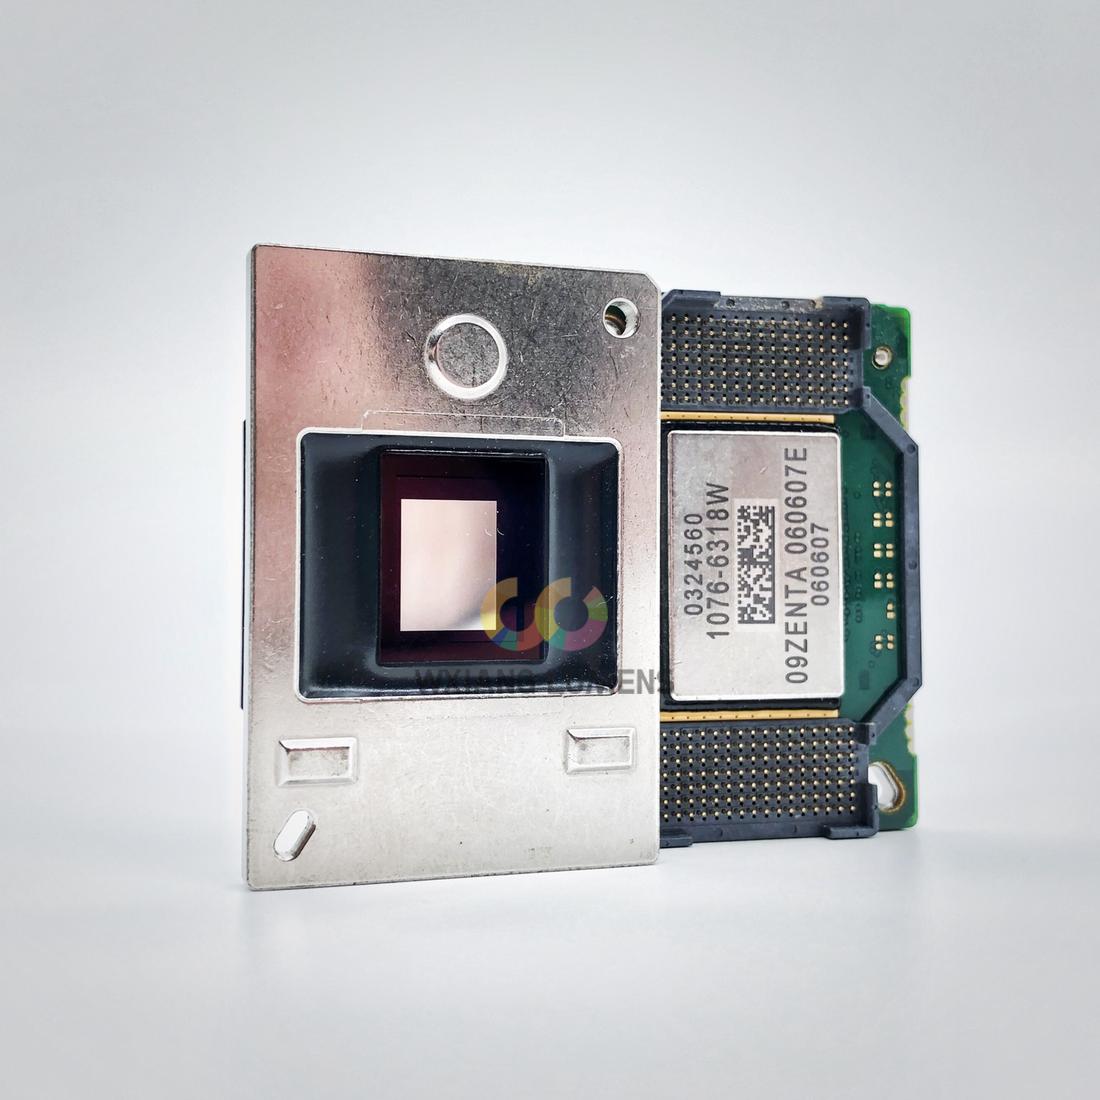 Proyector principal placa madre Control Panel 1076-6329w/1076-6318w/1076-6319w/1076-6328w para Optoma DX606i... Optoma DX609 DX609i